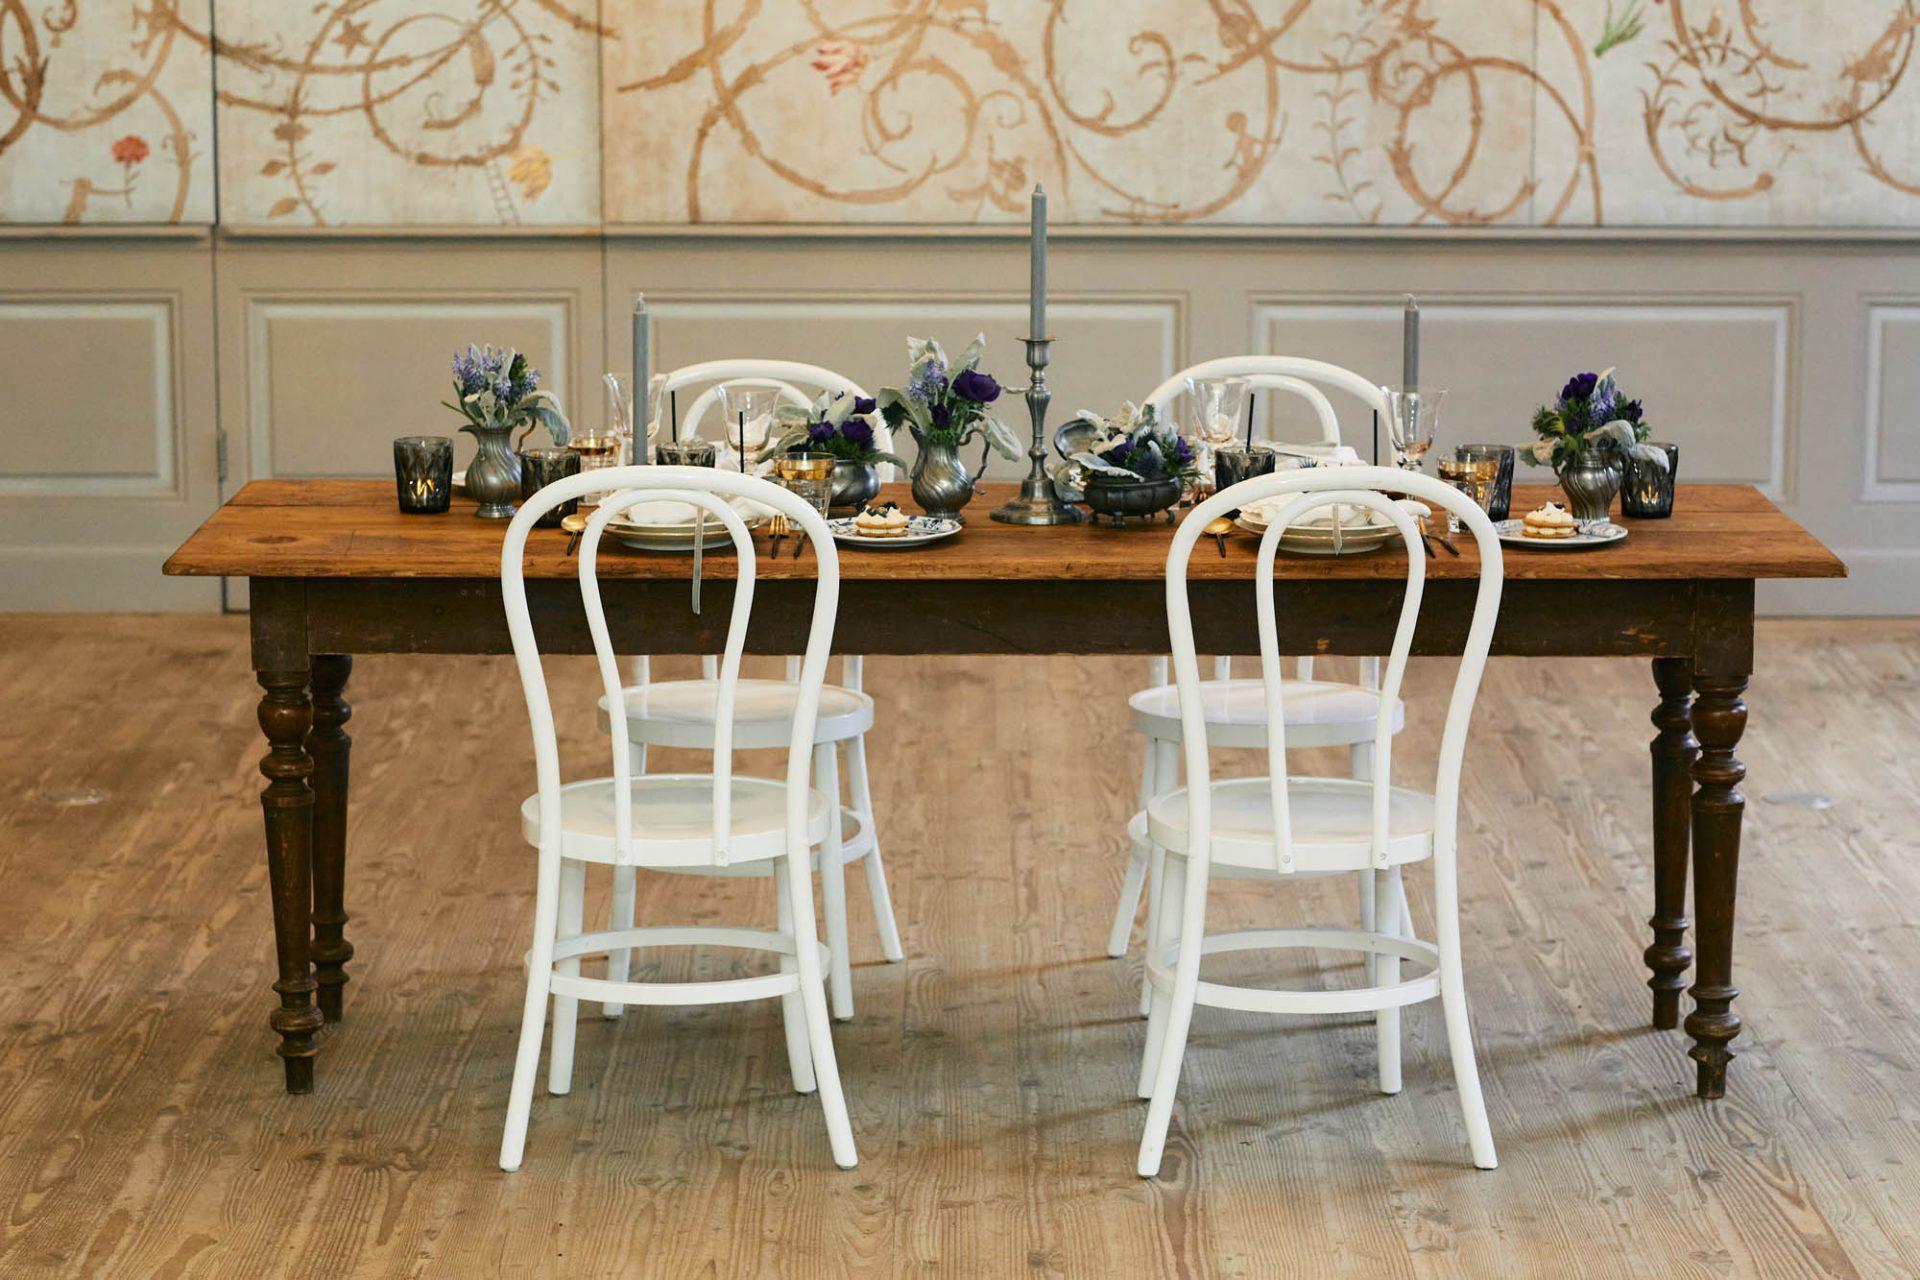 Blau-weißes Tiny-Wedding in Schloss Benrath.